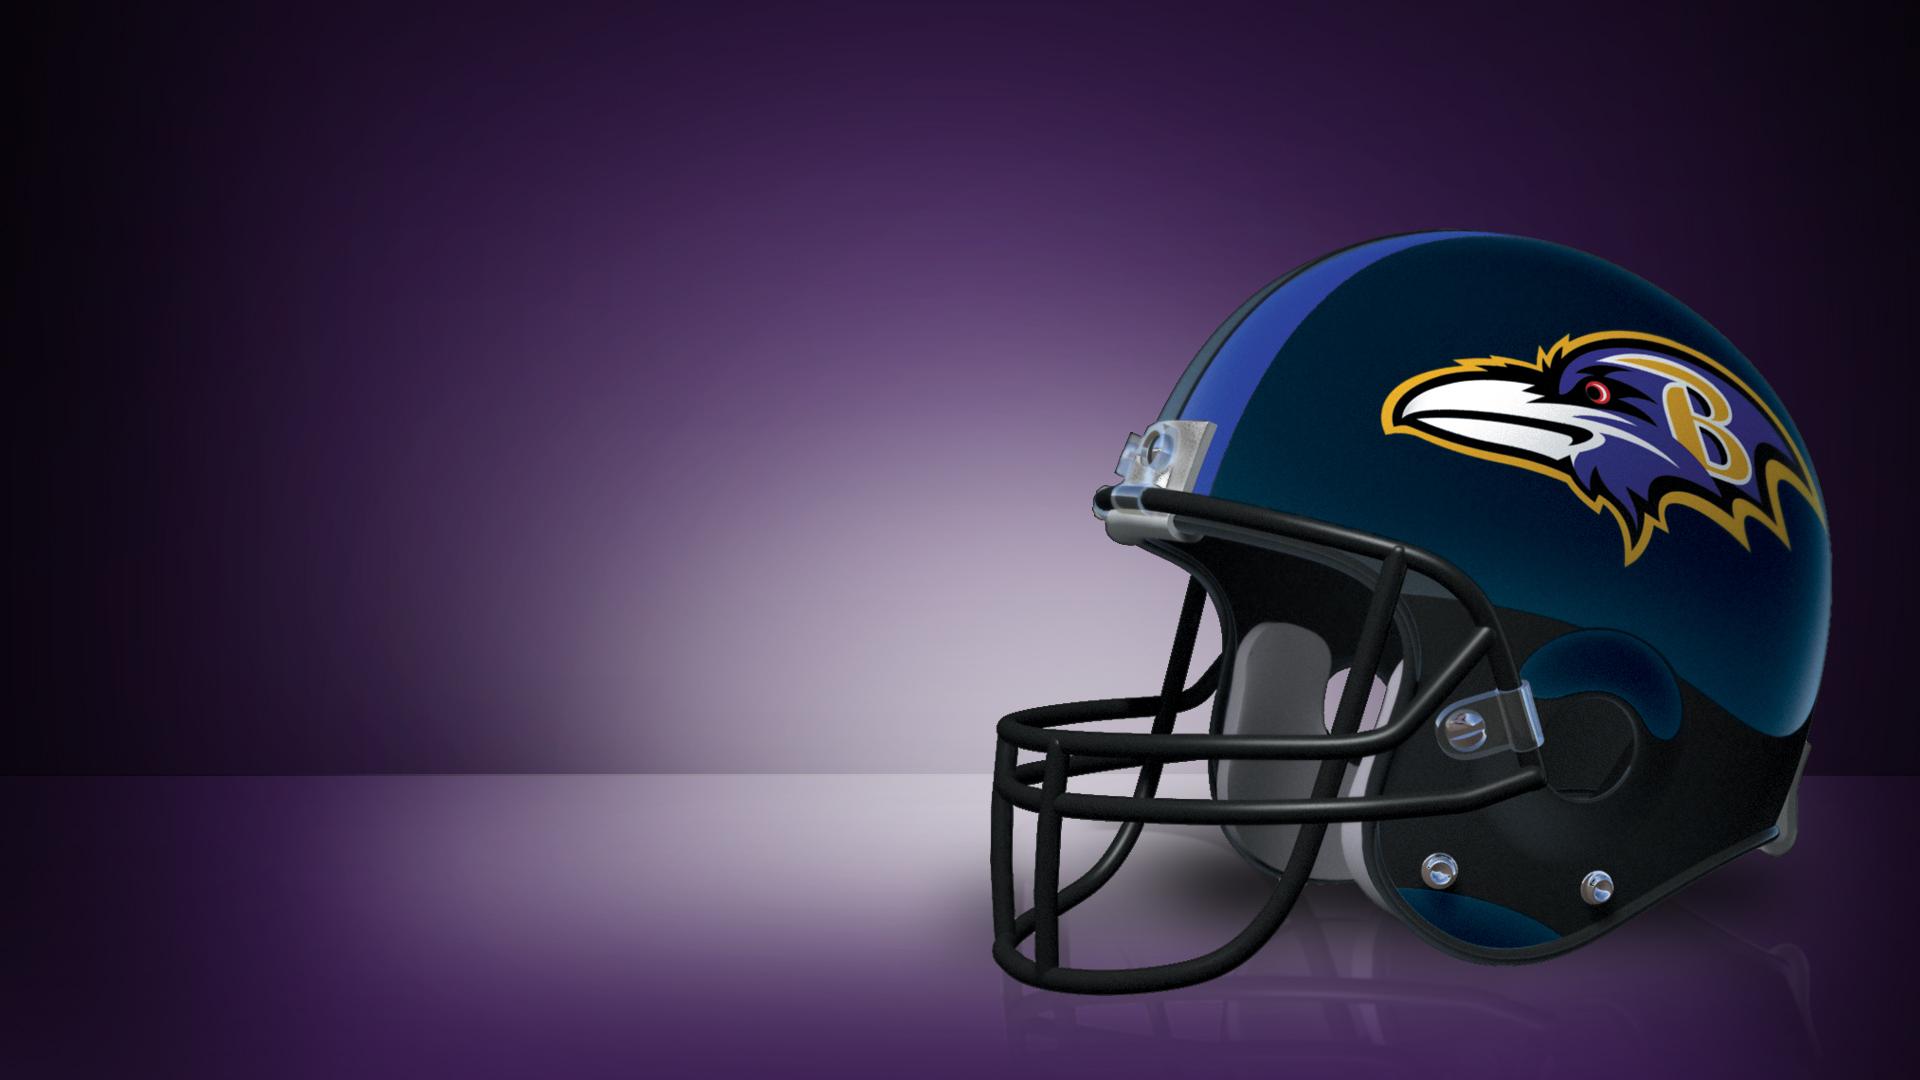 grey brick wallpaper seahawks helmet baltimore ravens seattle 1920x1080